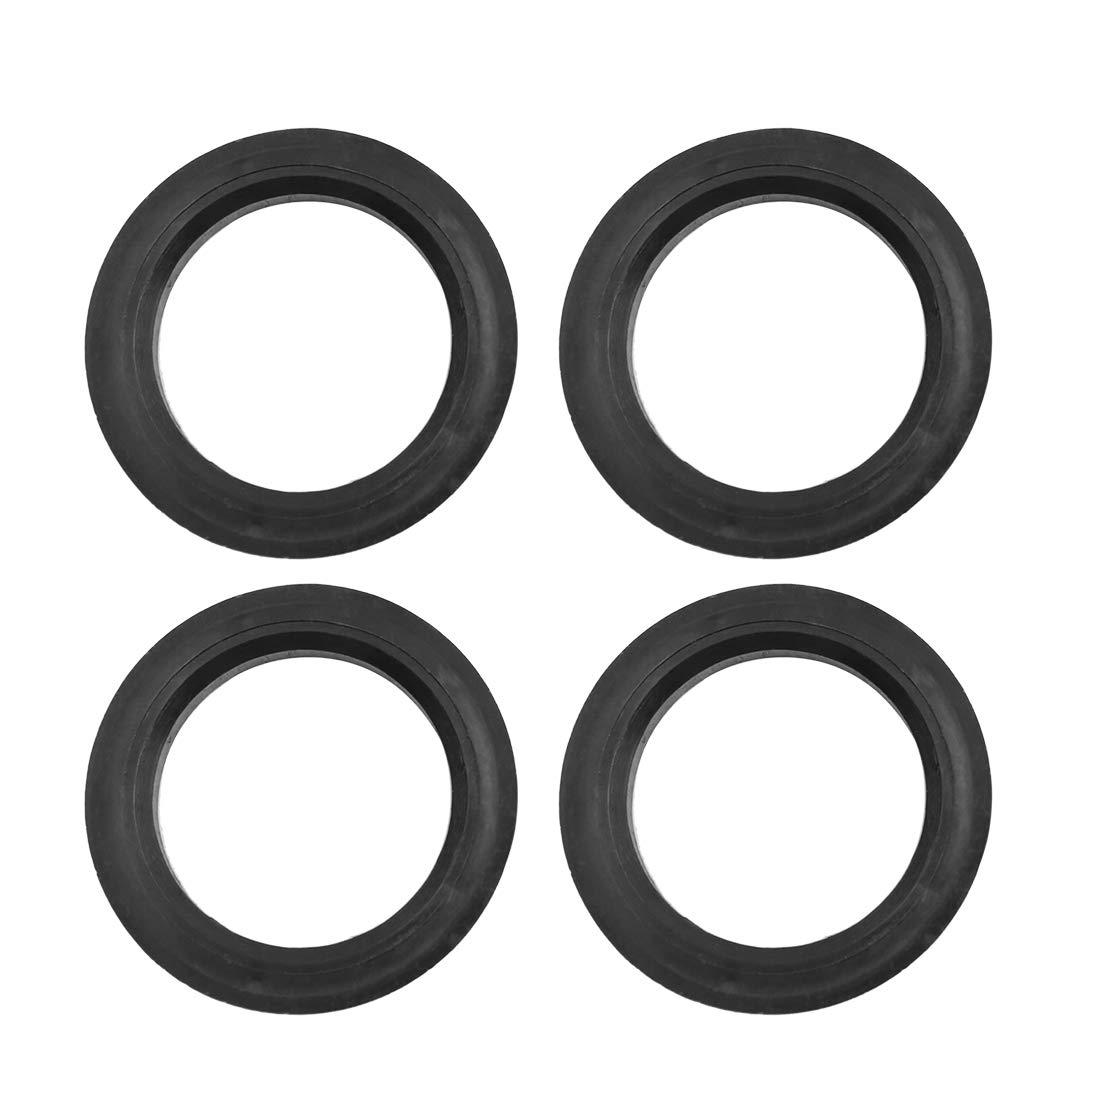 4pcs Black Plastic X AUTOHAUX Car Hub Centric Rings Wheel Bore Center 66.6 to 57.1mm